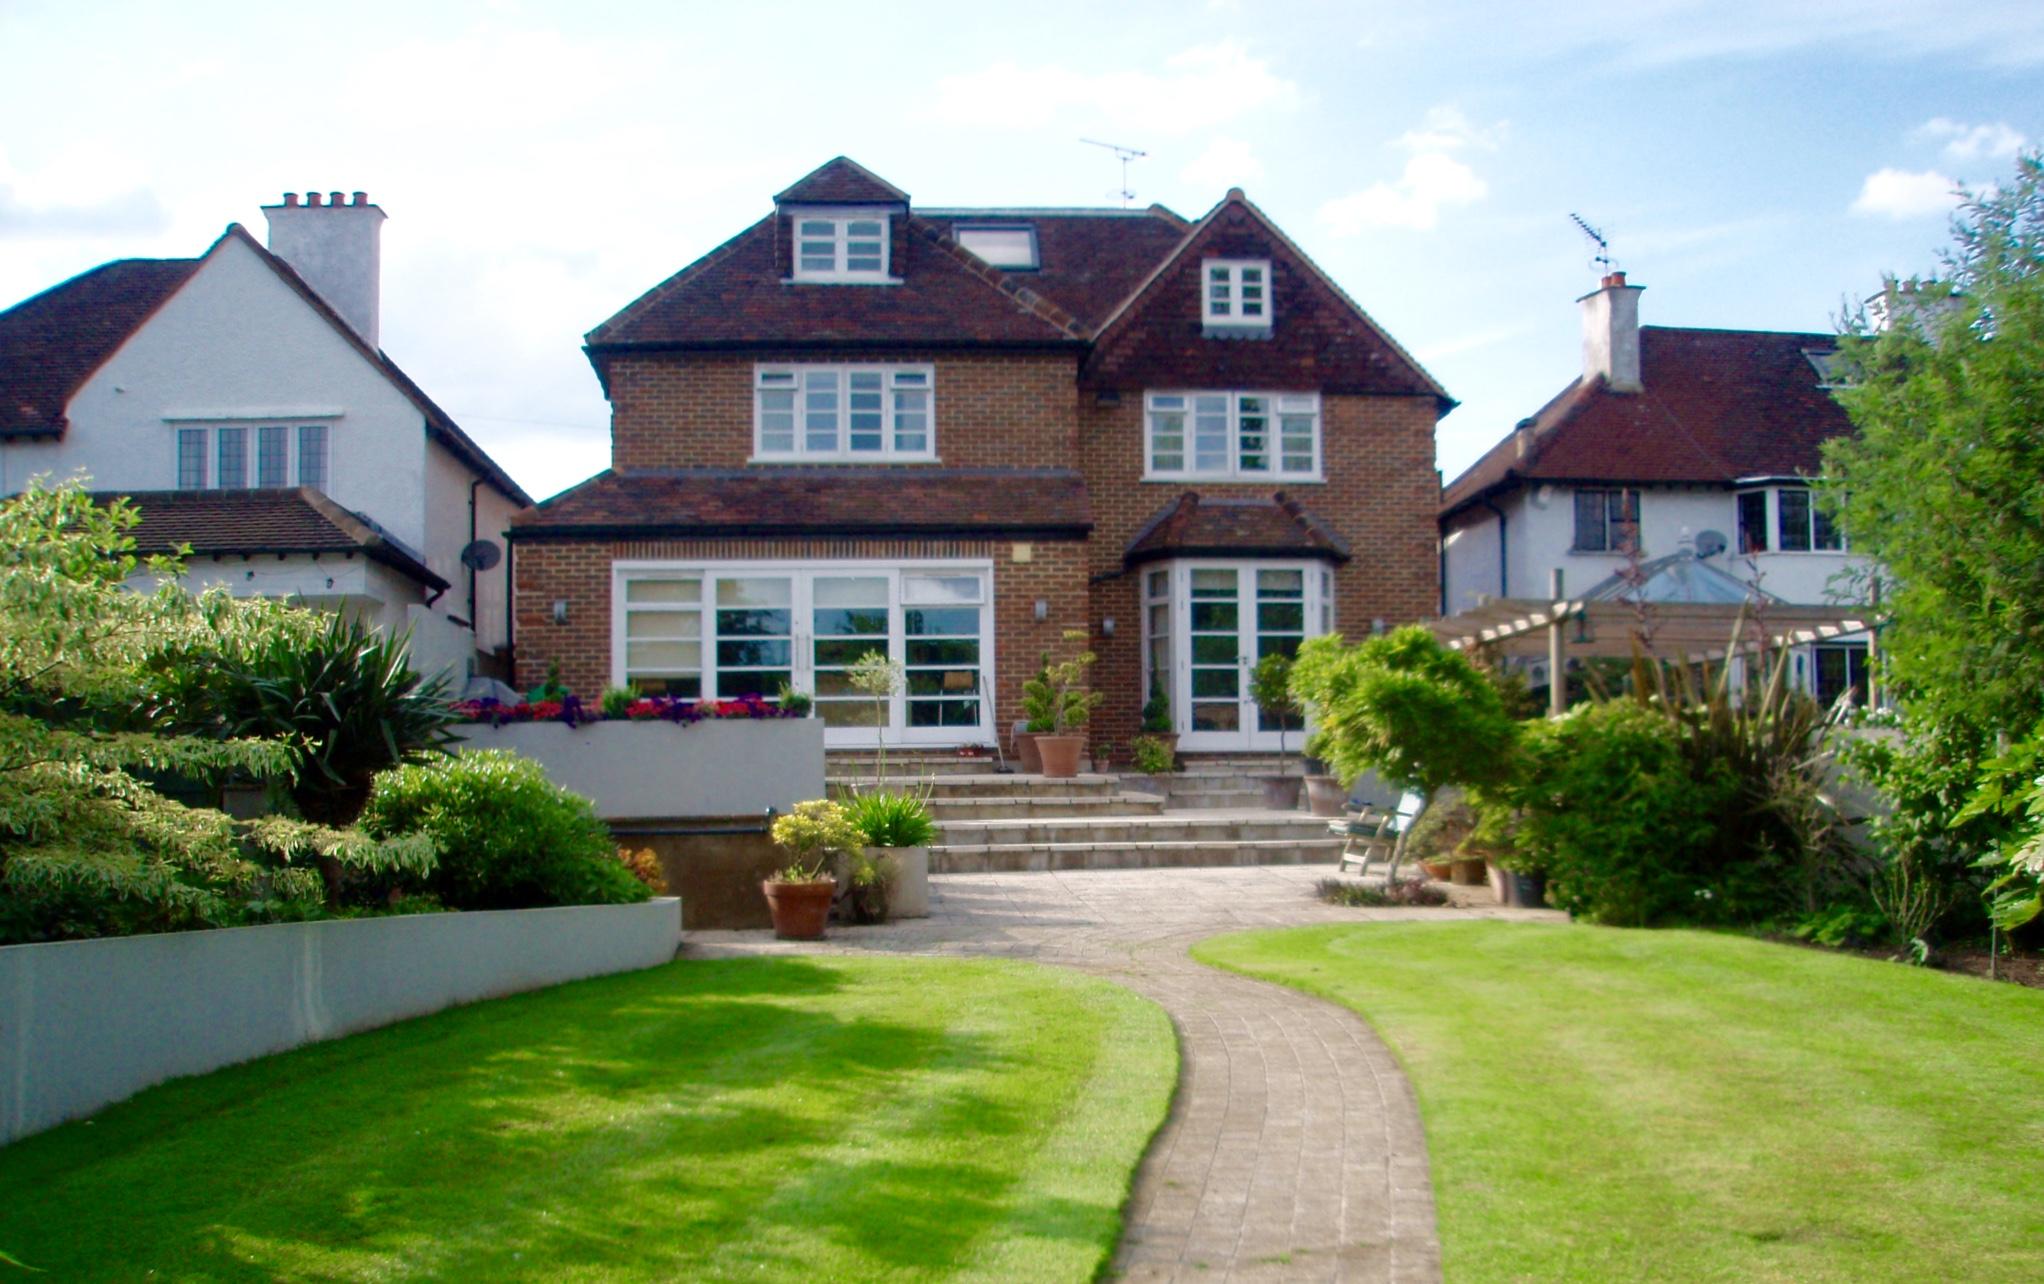 Rear View of Full House Development